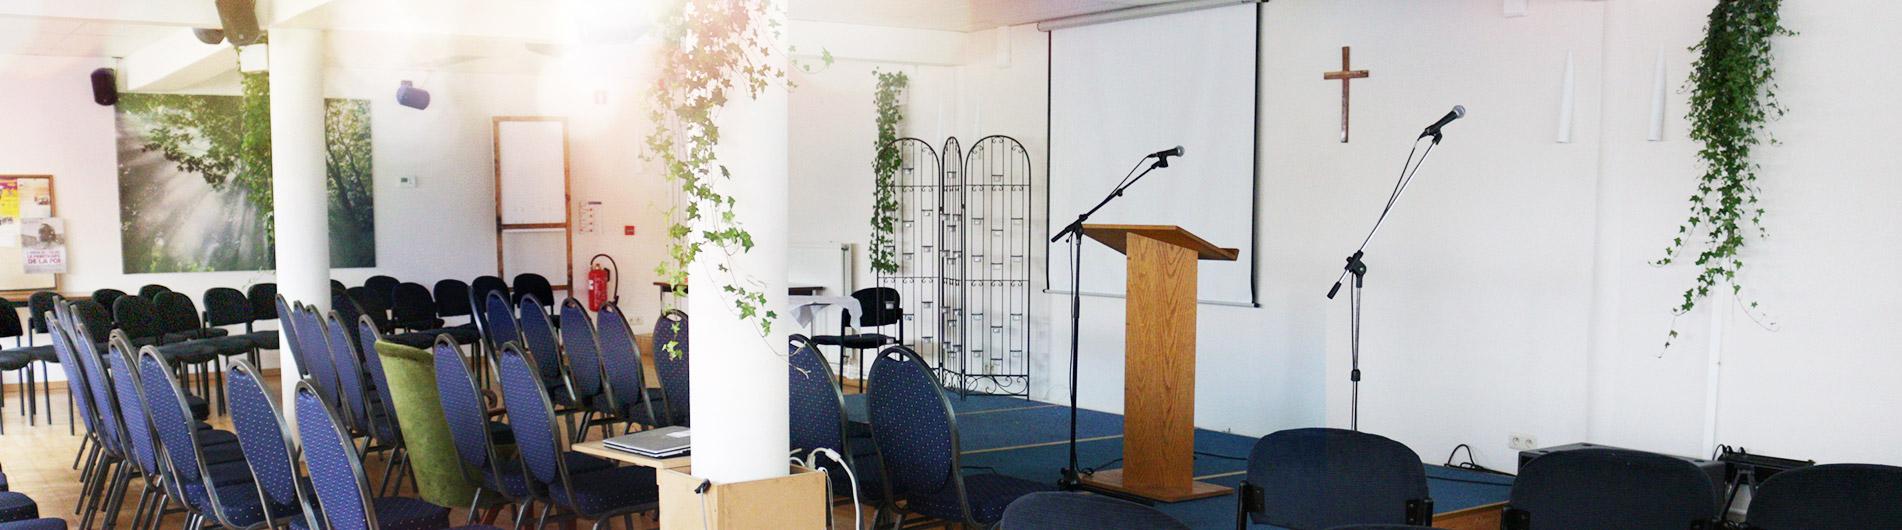 La salle de culte